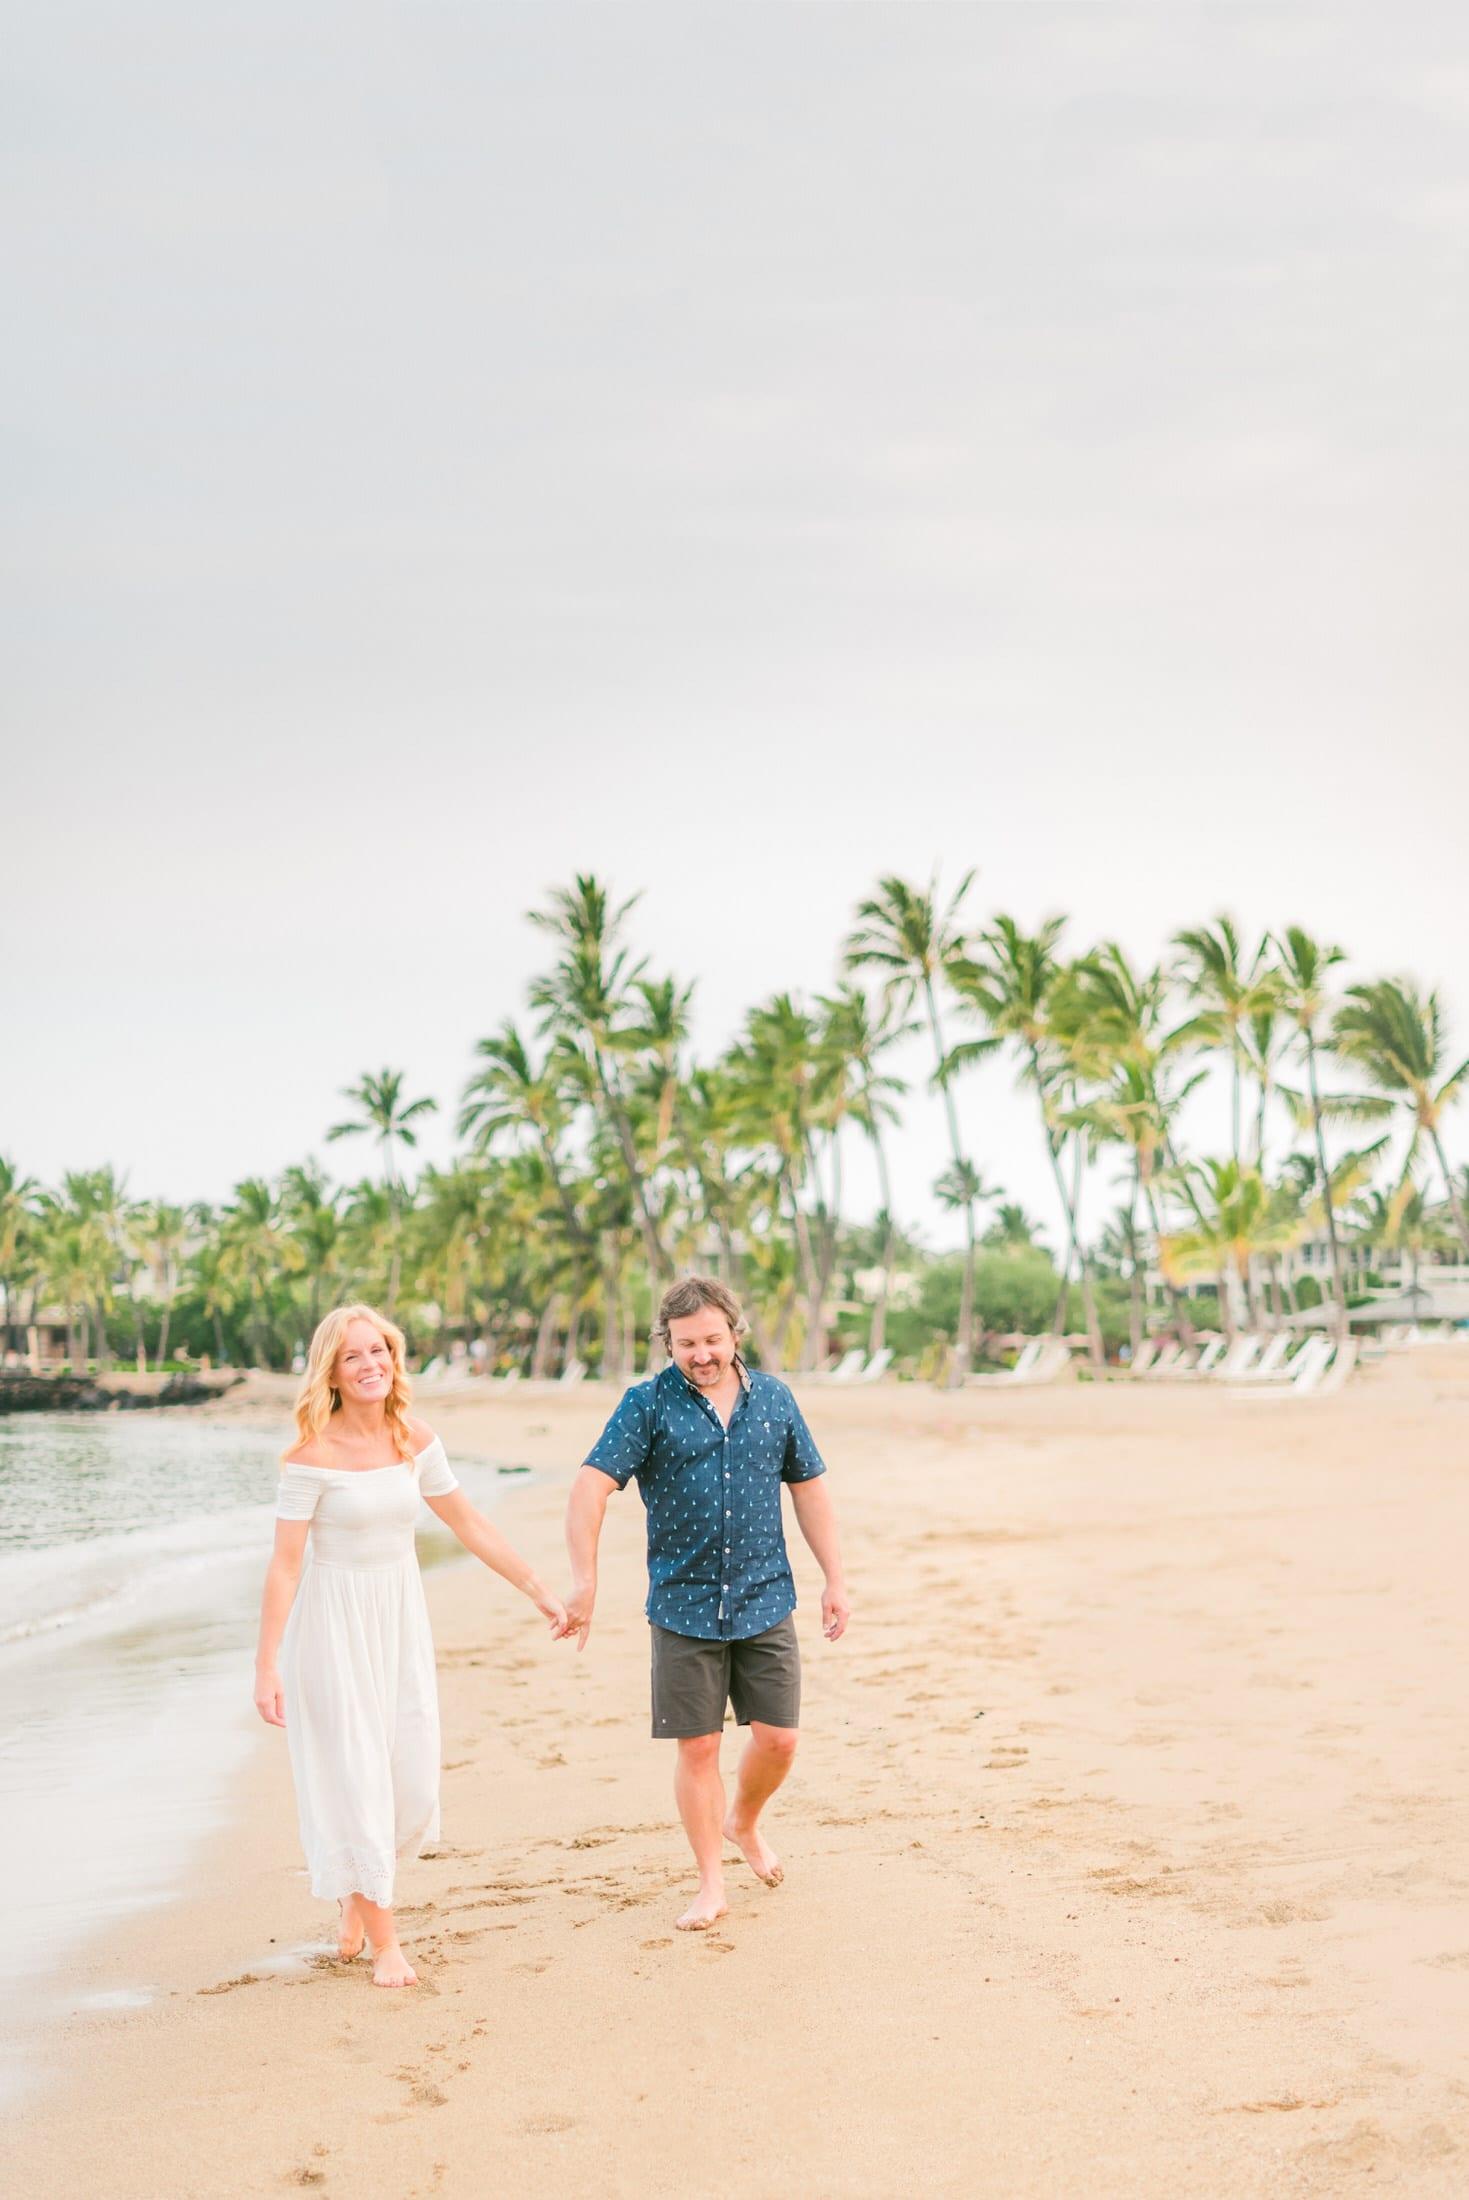 Waikoloa-Beach-Family-Photographer-Hawaii-52-1.jpg